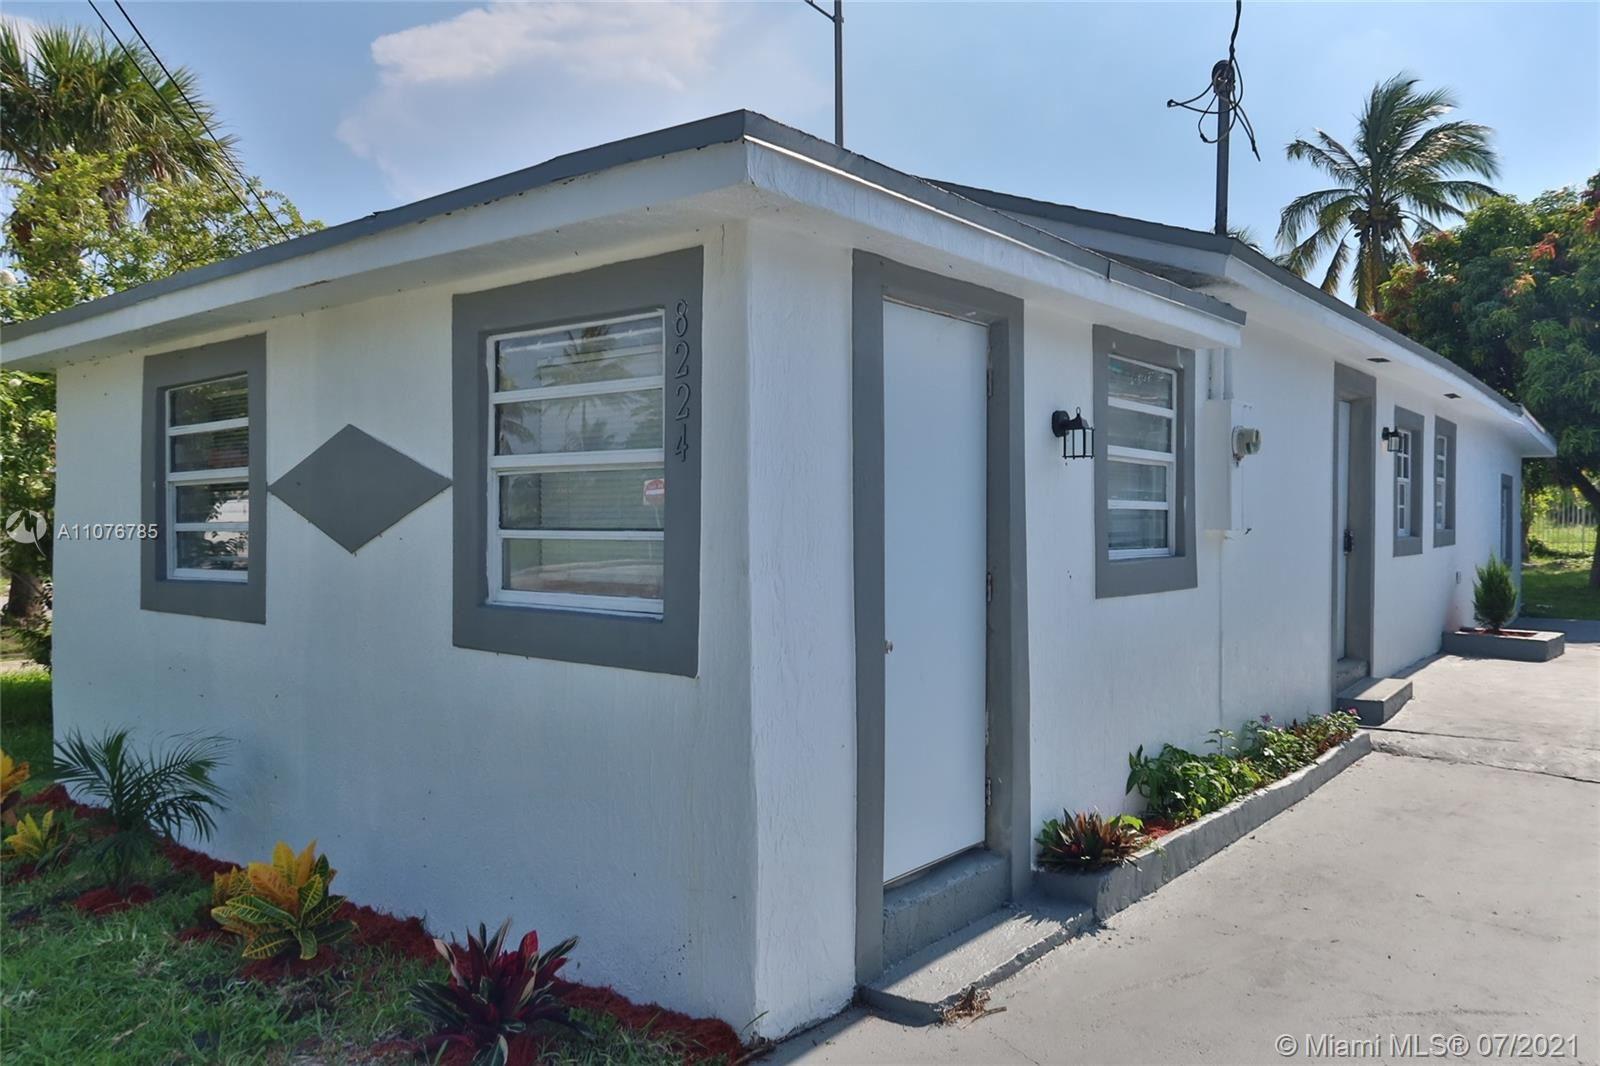 Photo of 8224 NW 1st Pl, Miami, FL 33150 (MLS # A11076785)